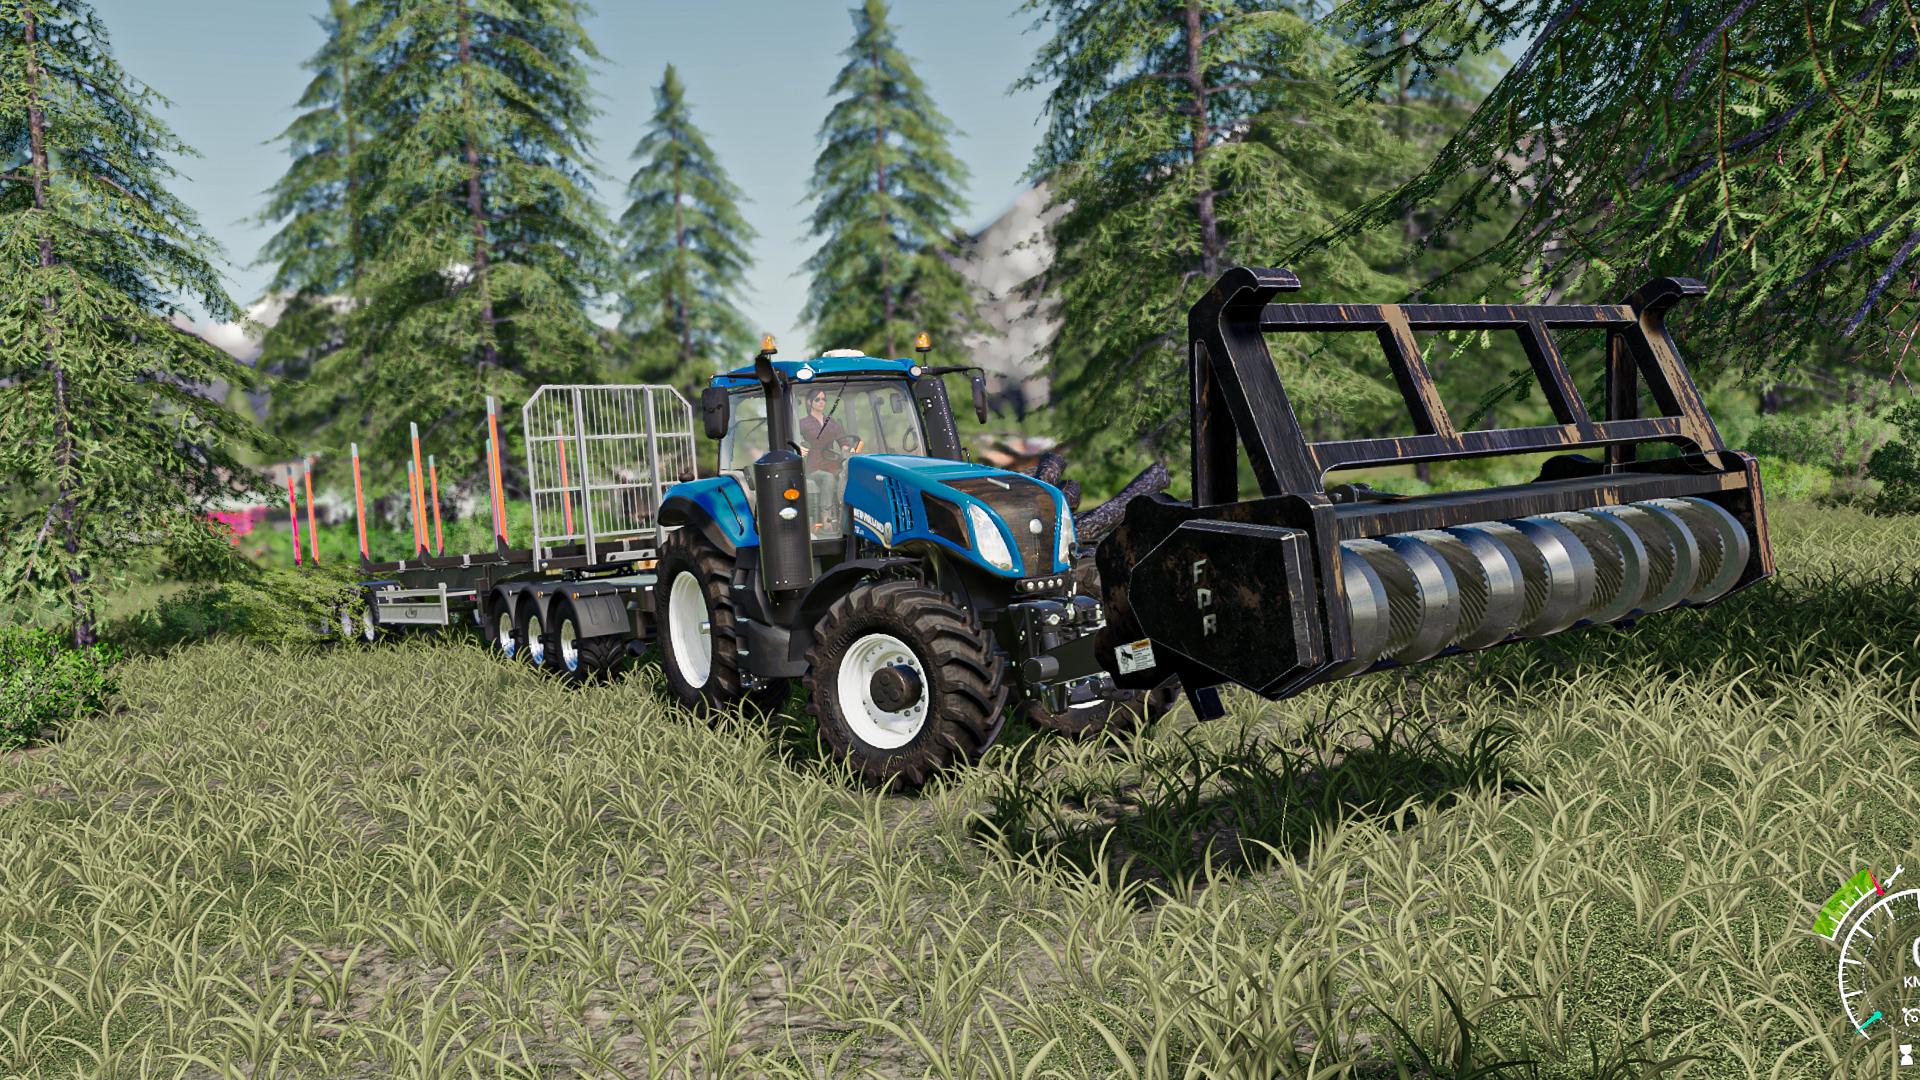 Wallpaper Farming Simulator 2019 Farming Simulator Tractors Car Forest By B Nyamin Youtube New Holland New Holland T8 1920x1080 Bigsong 1873415 Hd Wallpapers Wallhere